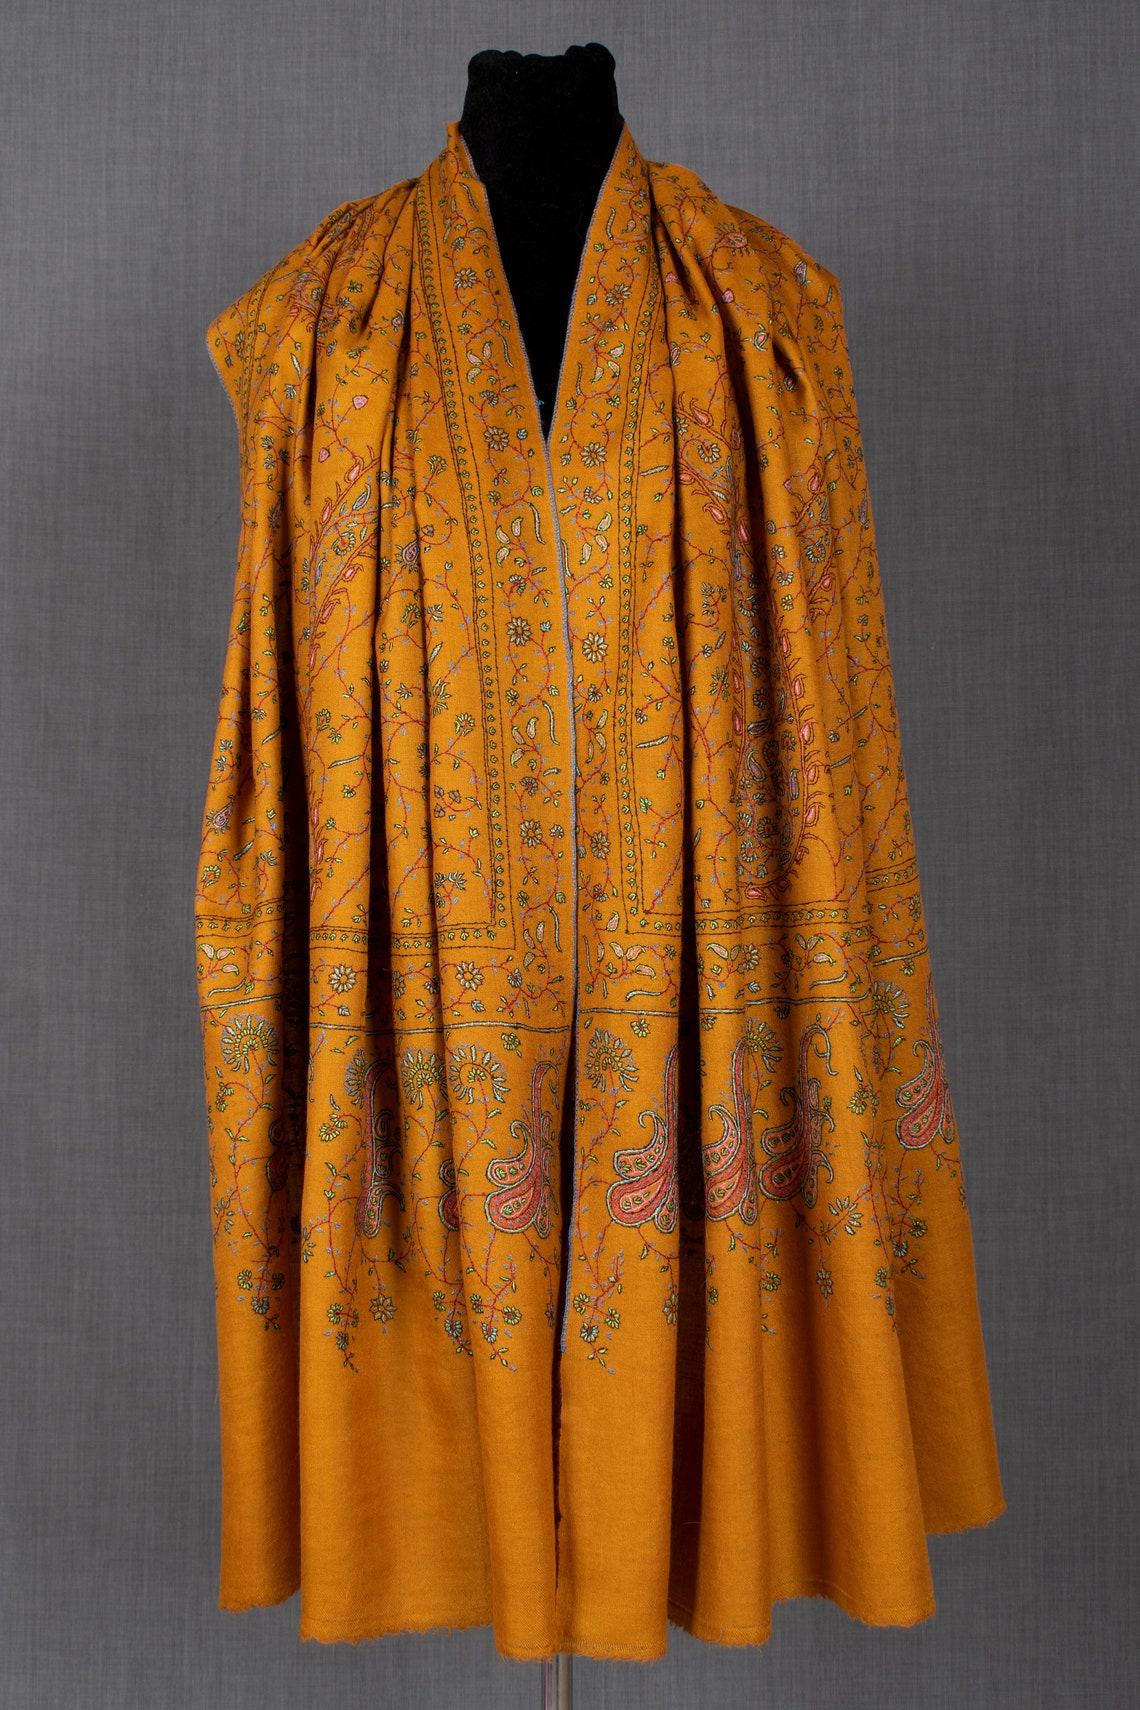 Salisa Pashmina Shawl Hand Embroidered Cashmere 40x80 image 0